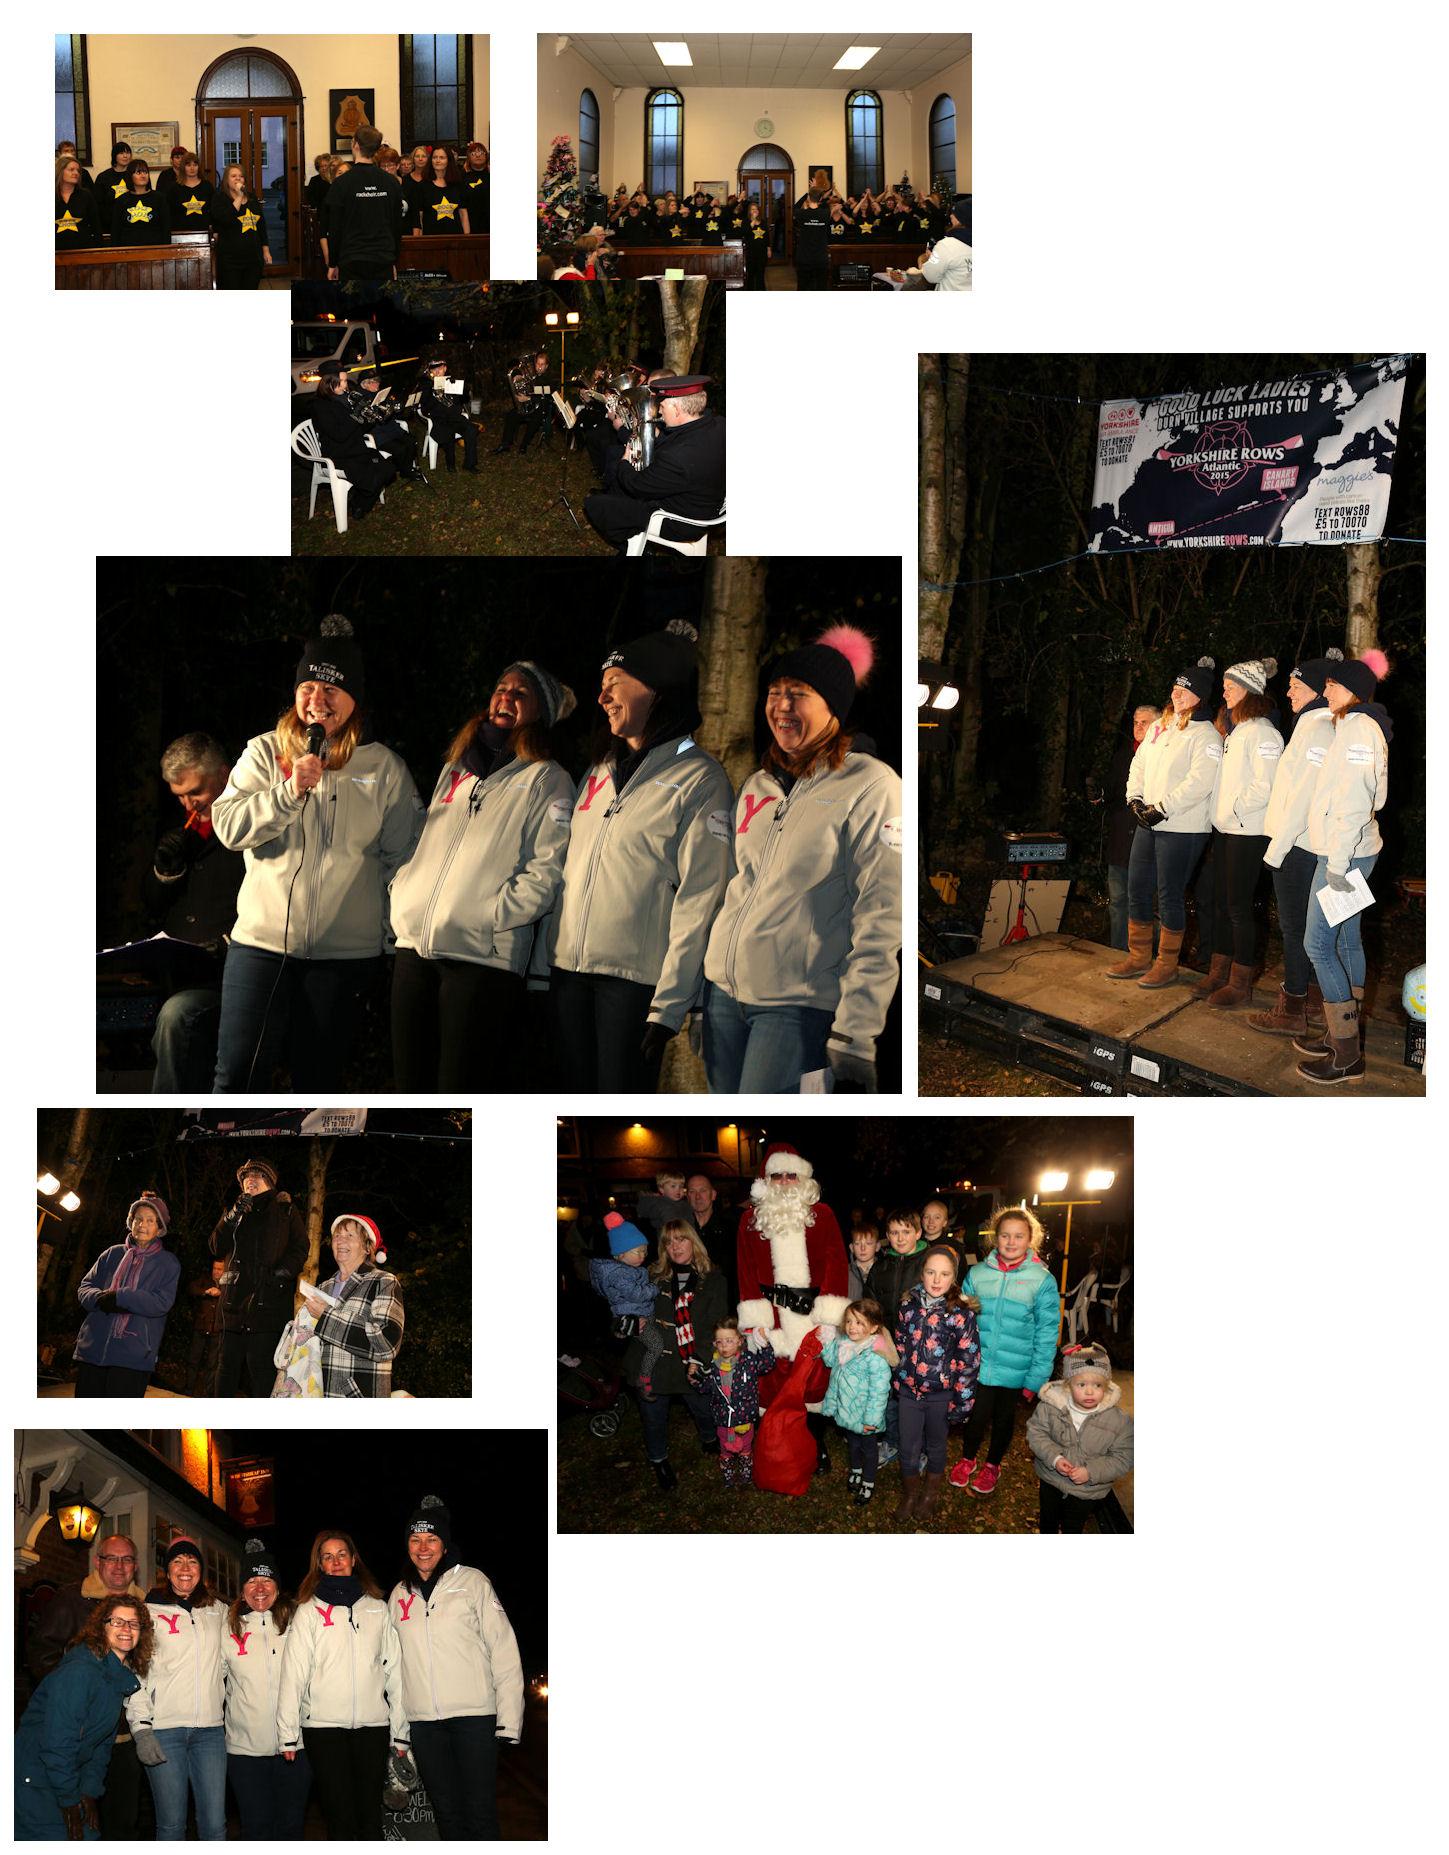 Xmas 15 collage